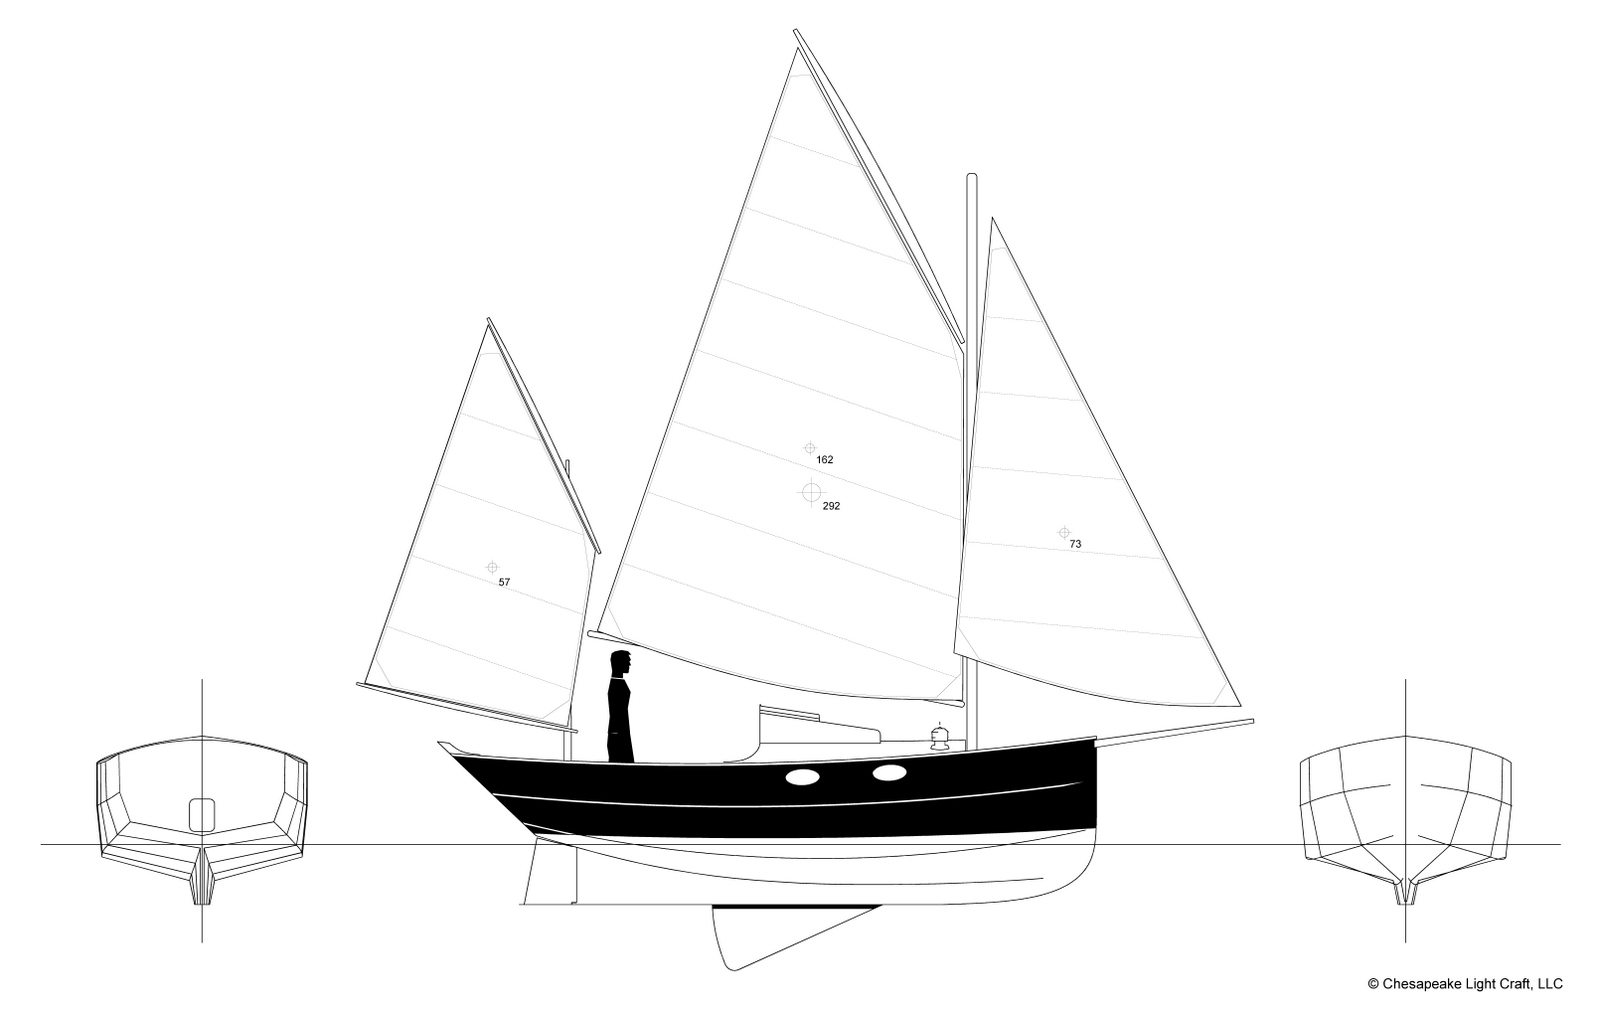 Craigslist Atlanta Boat Motors Wallpaperzen Org